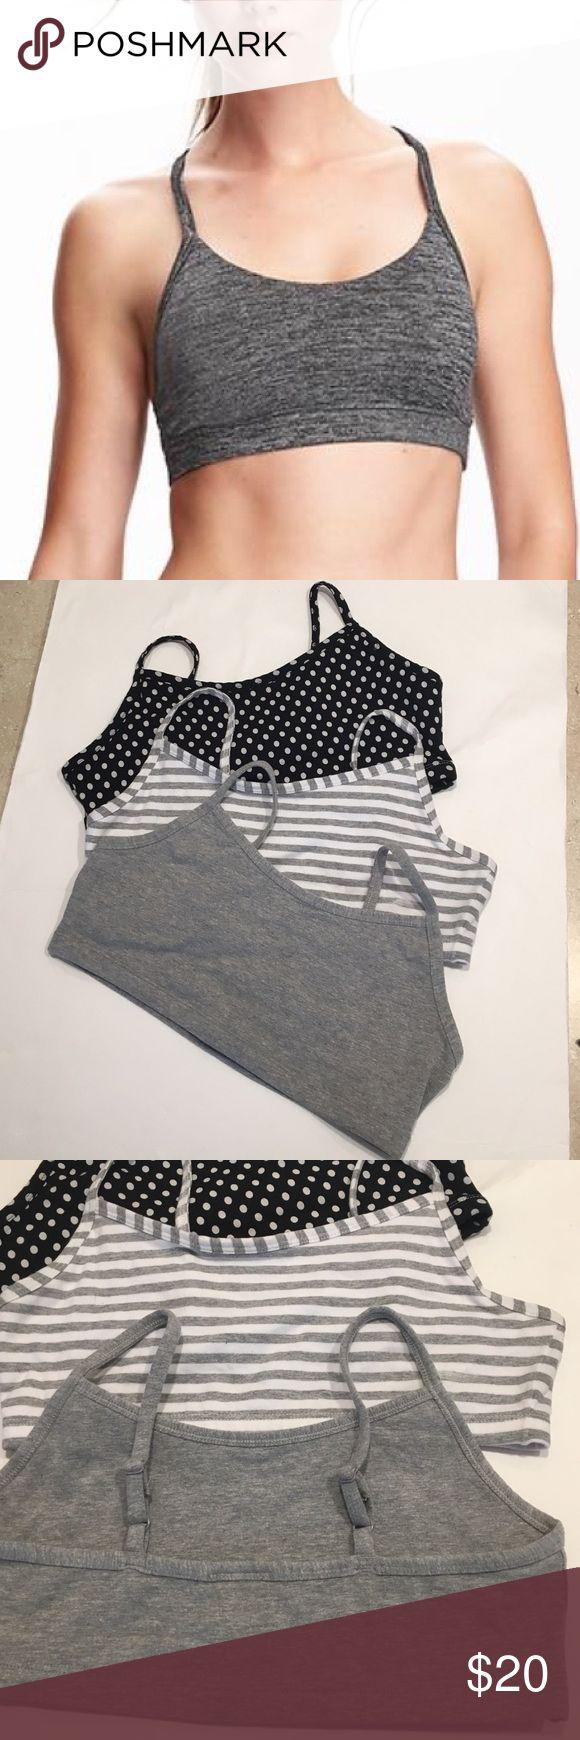 OLD NAVY, 3 Cami Light Support bra's Size M NWOT , OLD NAVY Cami light sport bra, set of 3, machine washable, 96% polyester, 4% spandex Old Navy Intimates & Sleepwear Bras